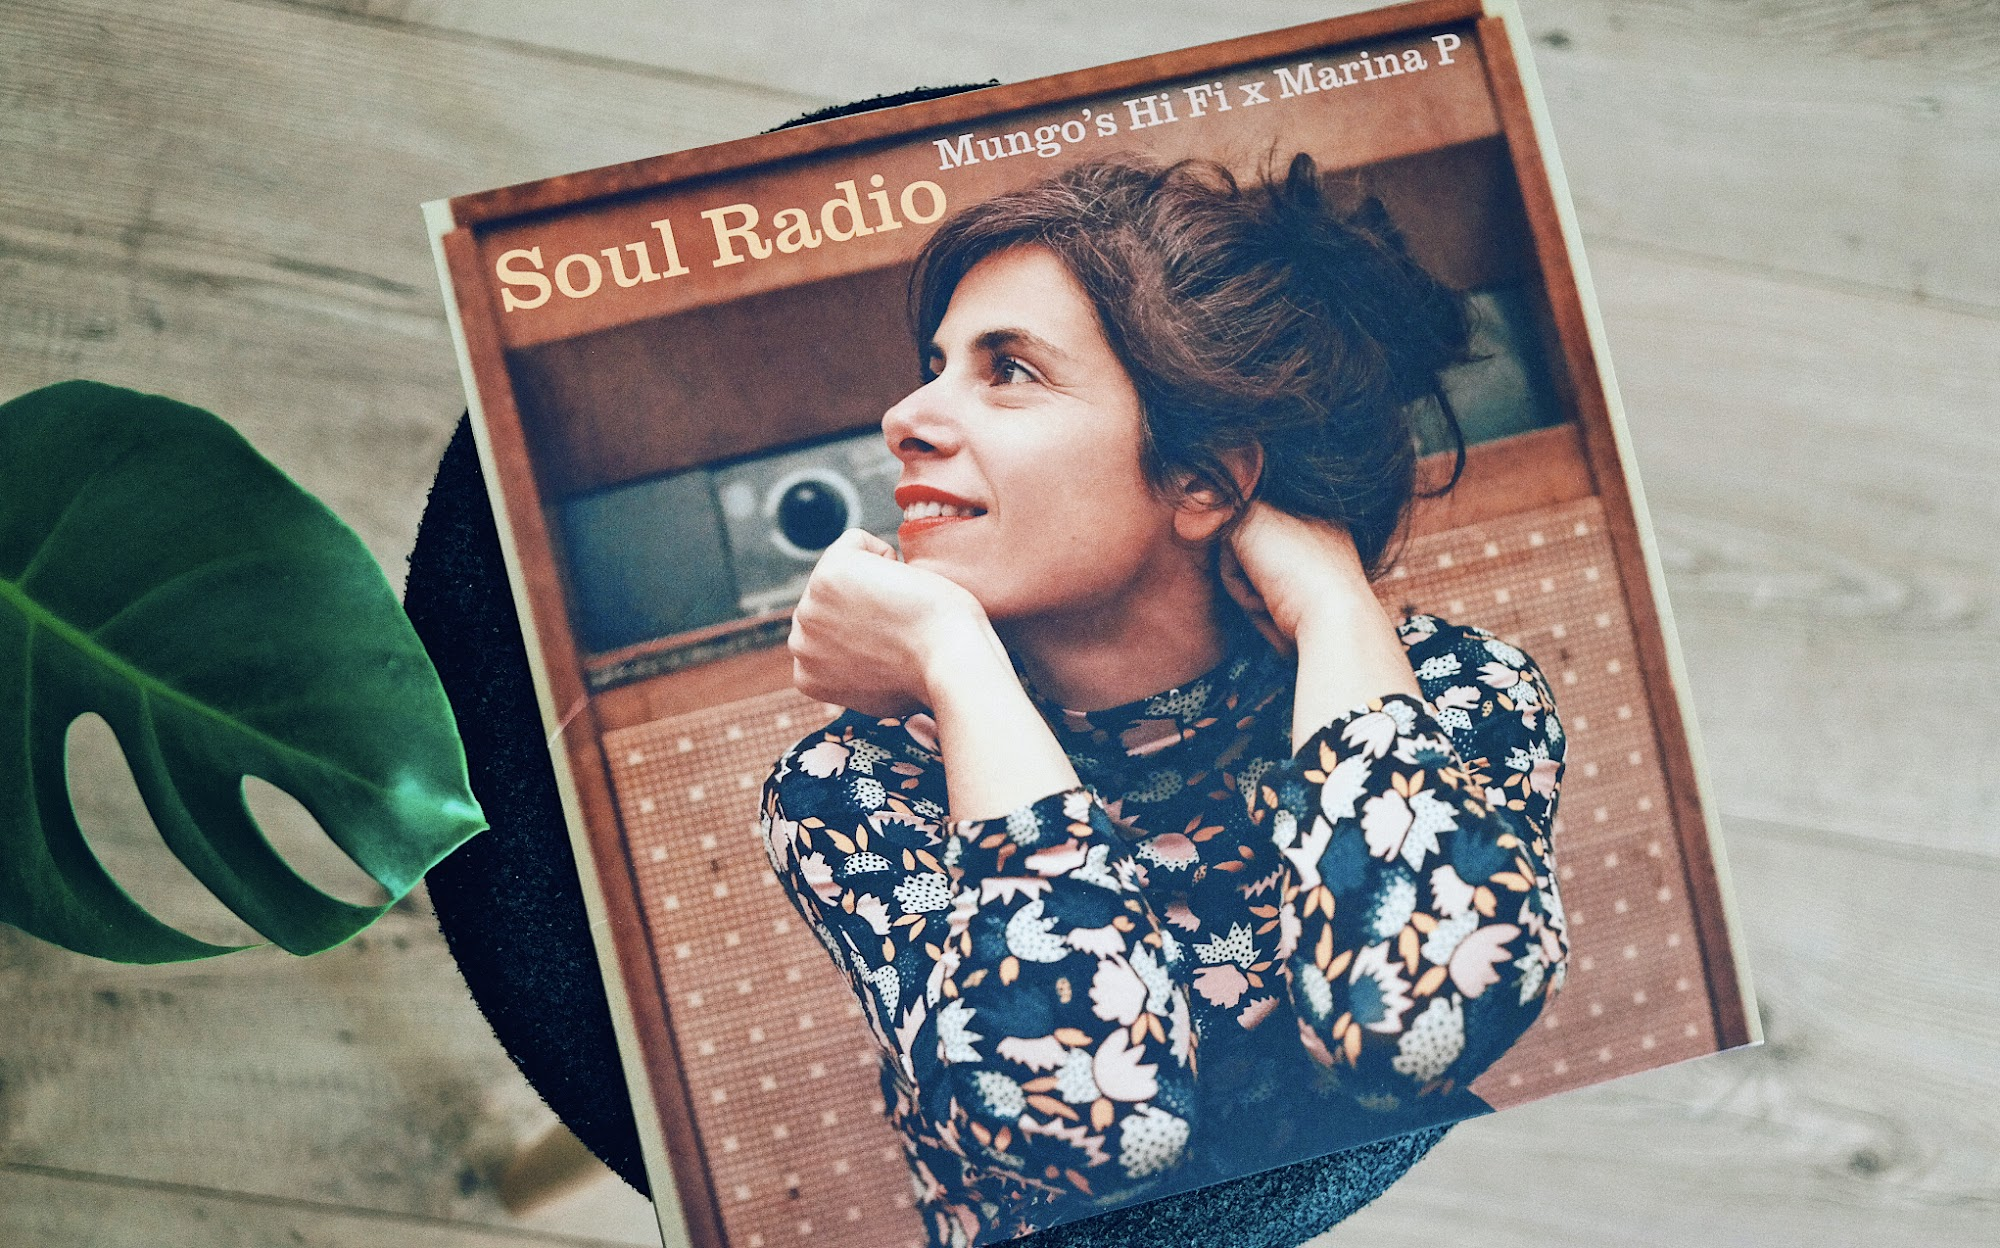 Mungo's Hi Fi x Marina P.  - Soul Radio | Neues aus der Plattenküche im Full Album Stream